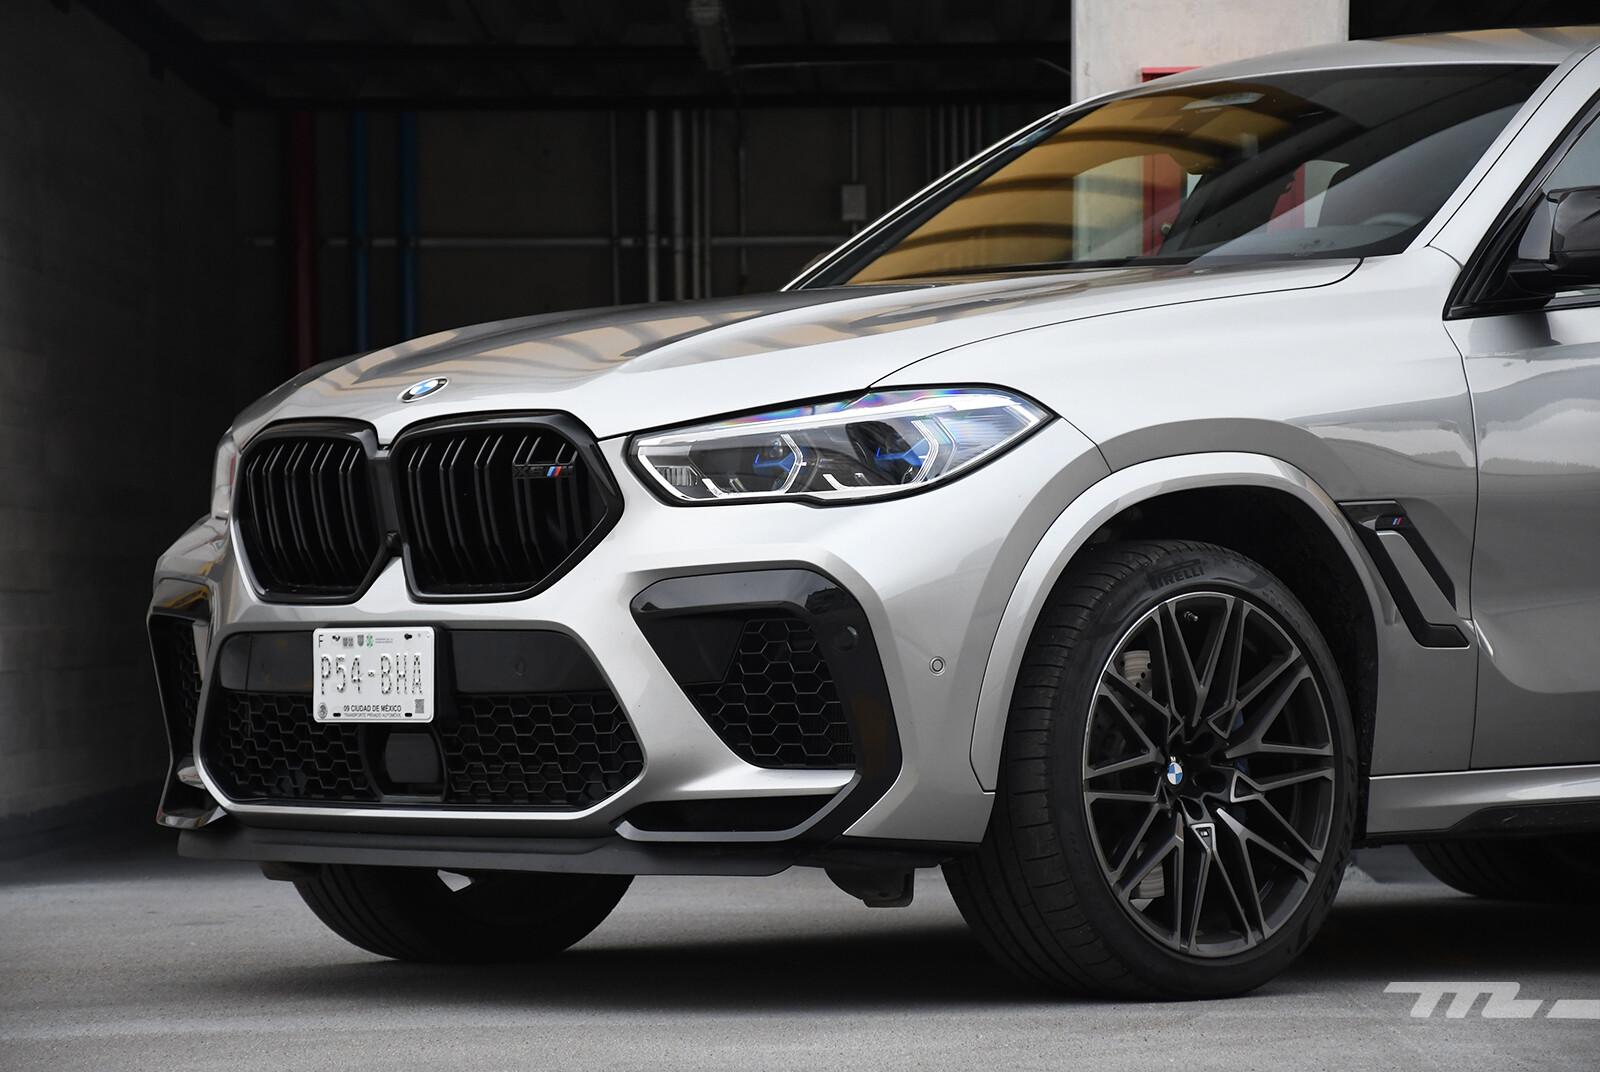 Foto de BMW X6 M Competition 2021 (prueba) (13/27)